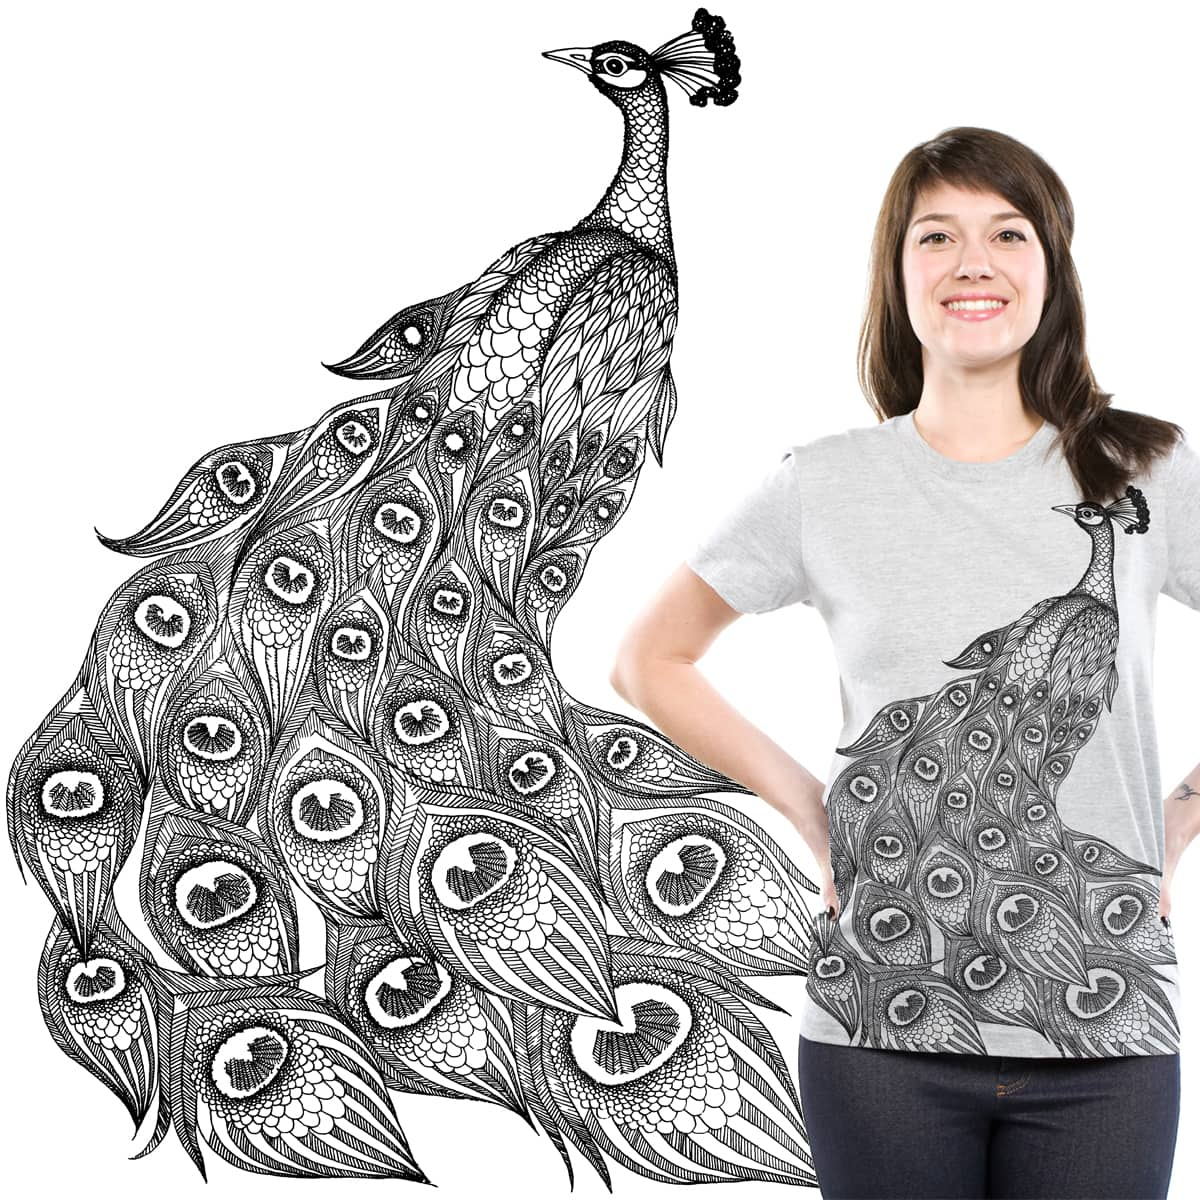 Peacock by J_Kiss on Threadless